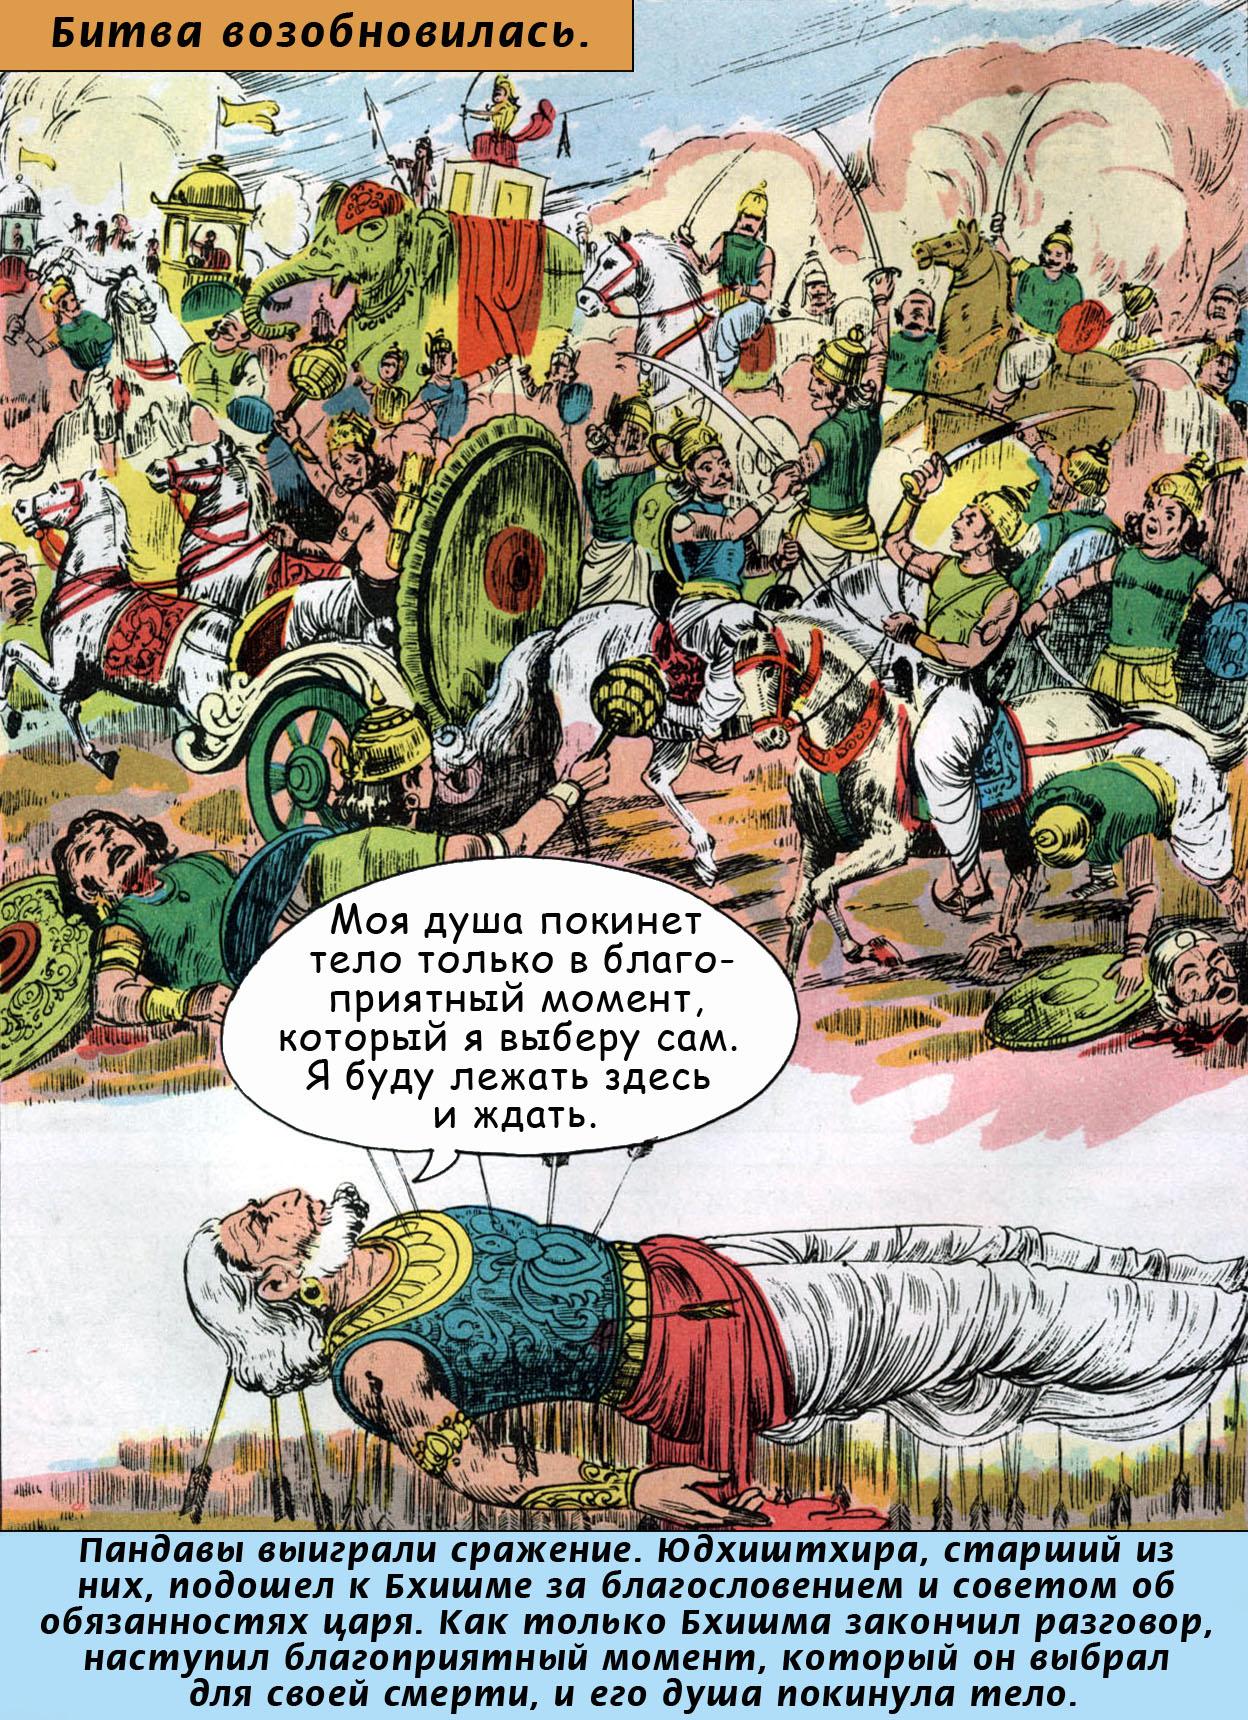 Бхишма 32 - ведический комикс